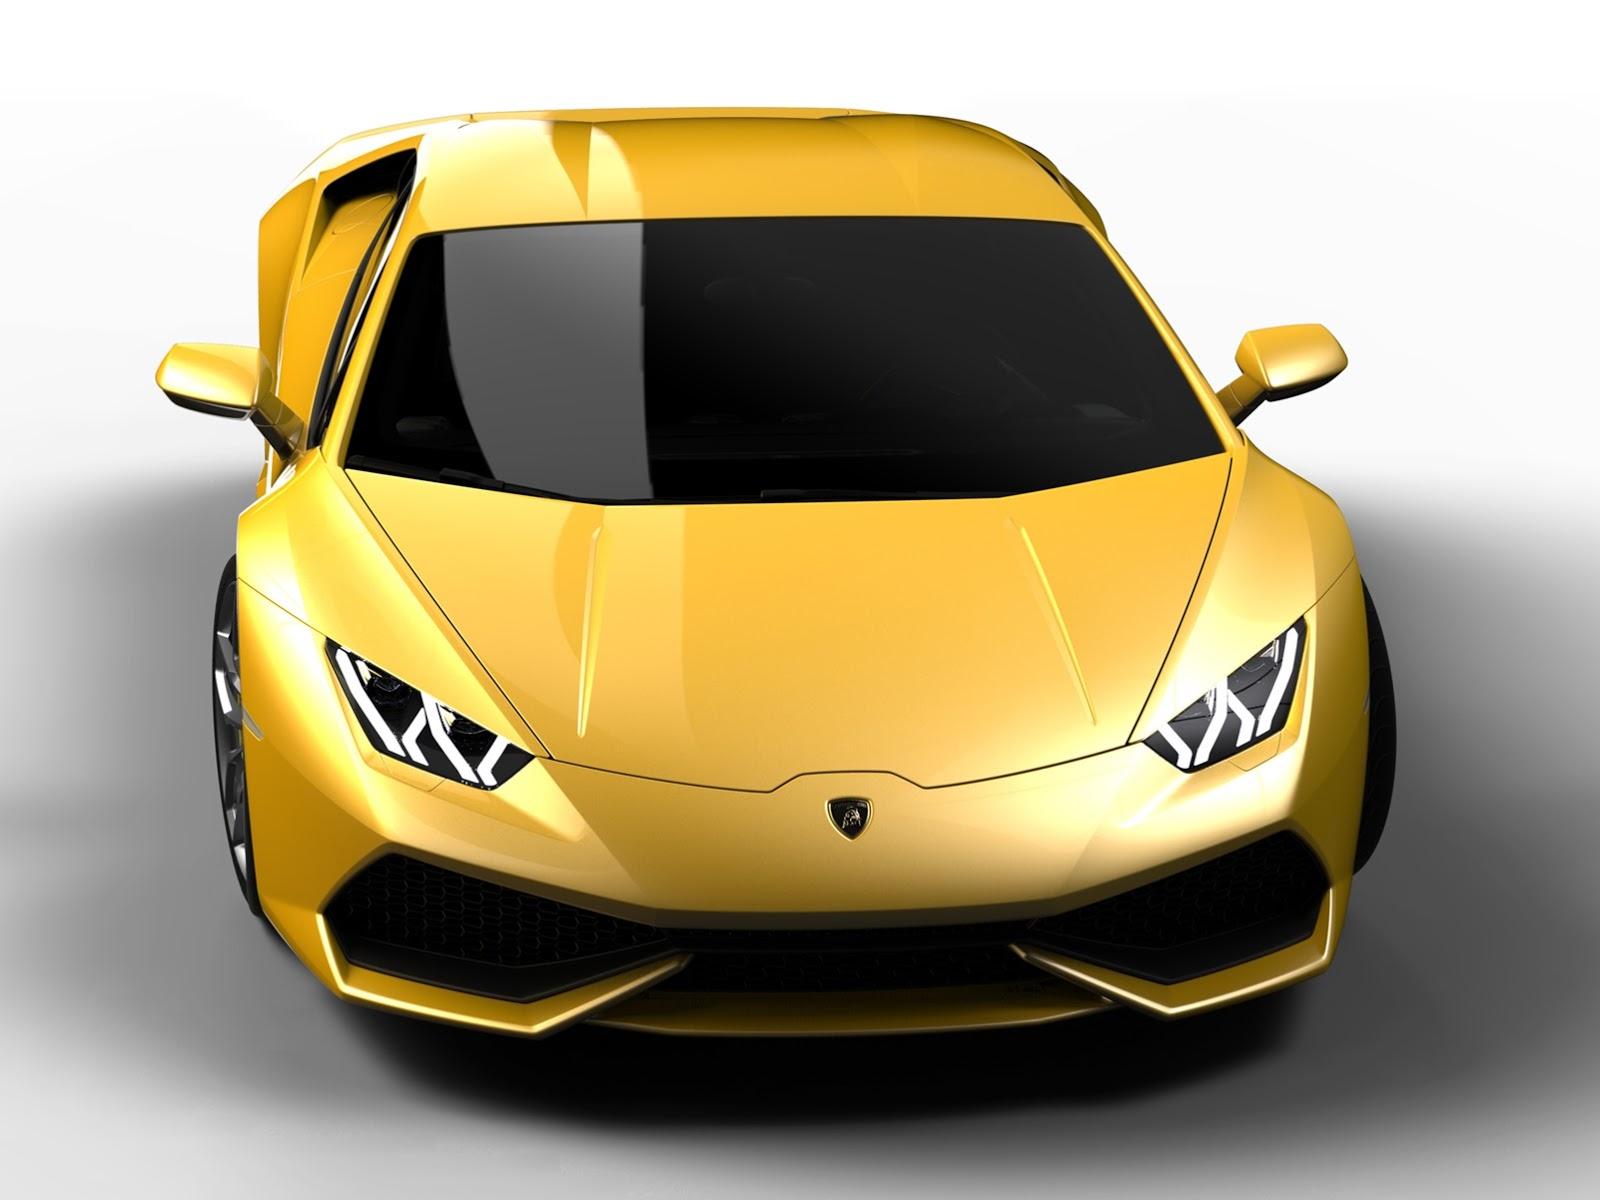 New-Lamborghini-Huracan-LP-610-4-pics-top